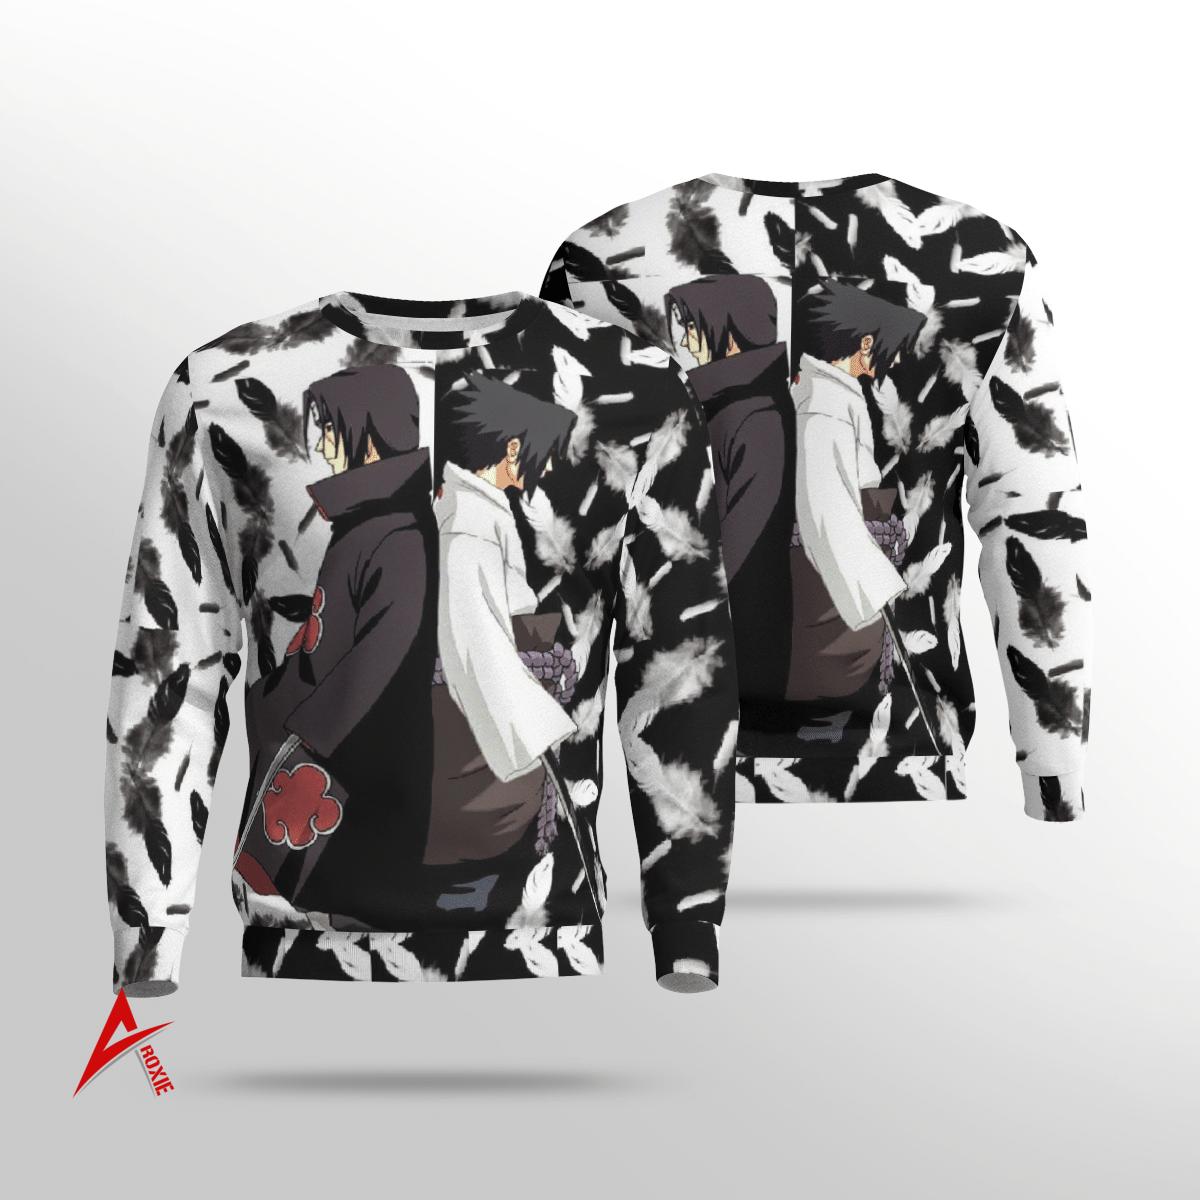 Itachi vs Sasuke Sweatshirt 3D